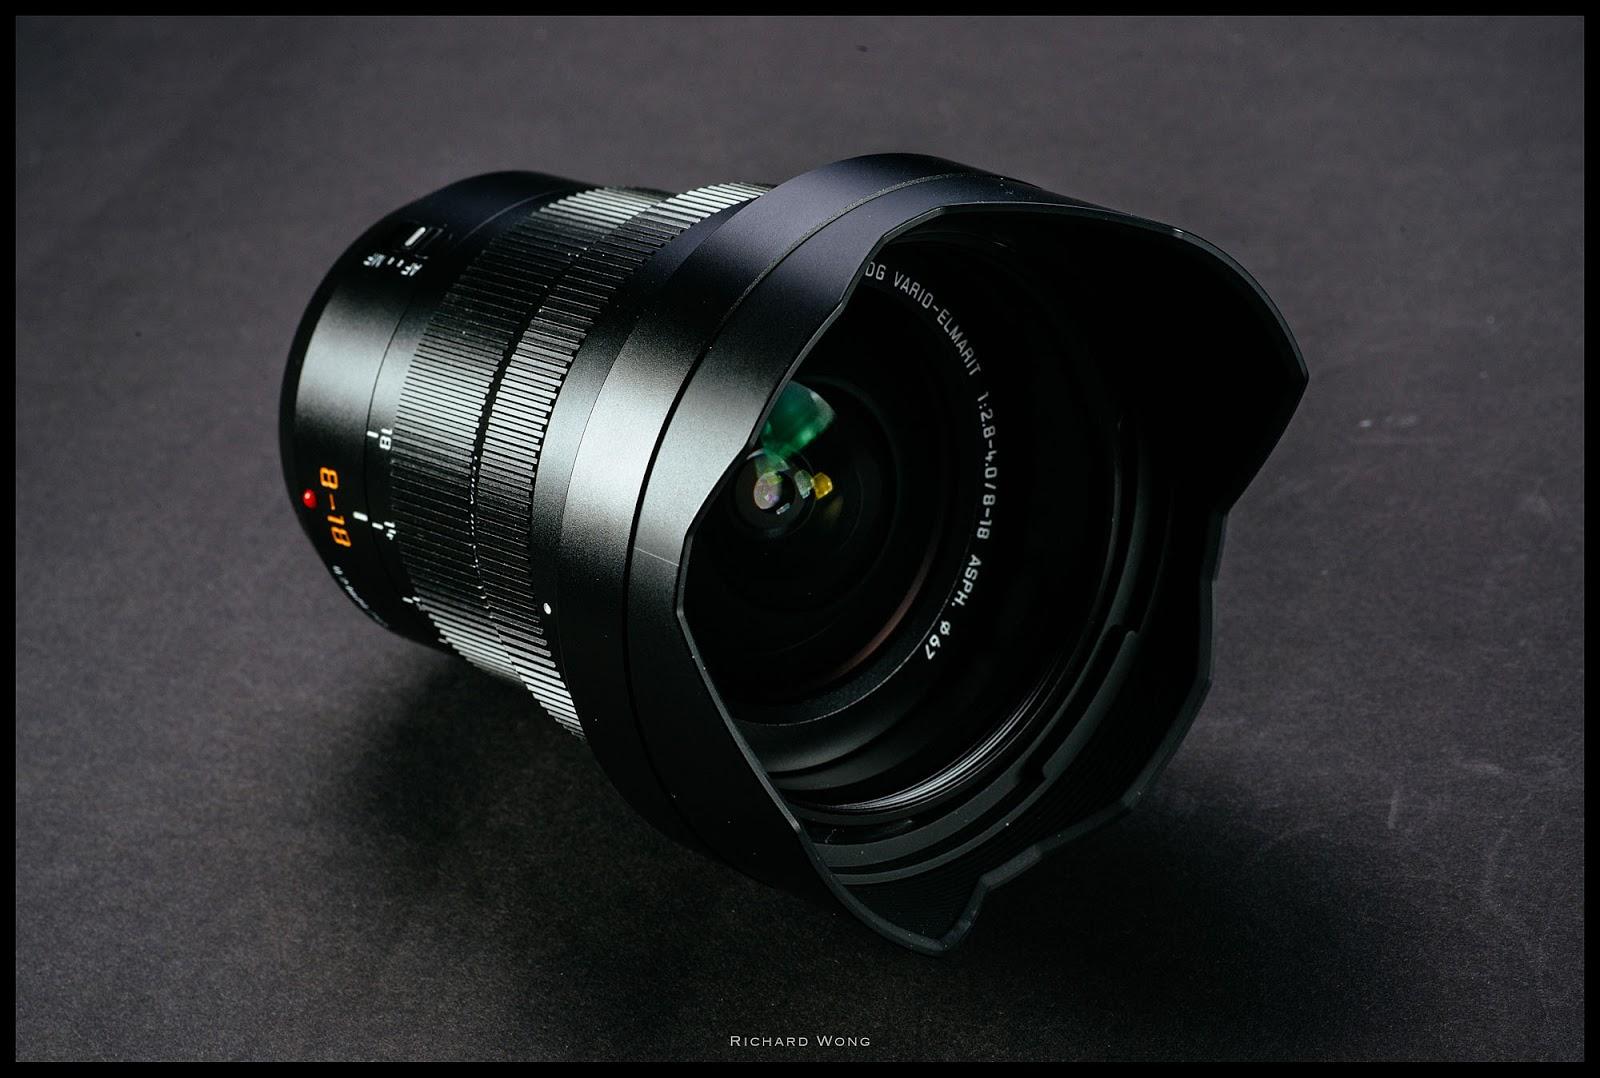 Leica DG Vario-Elmarit 8-18mm f/2.8-4.0 Asph, вид спереди